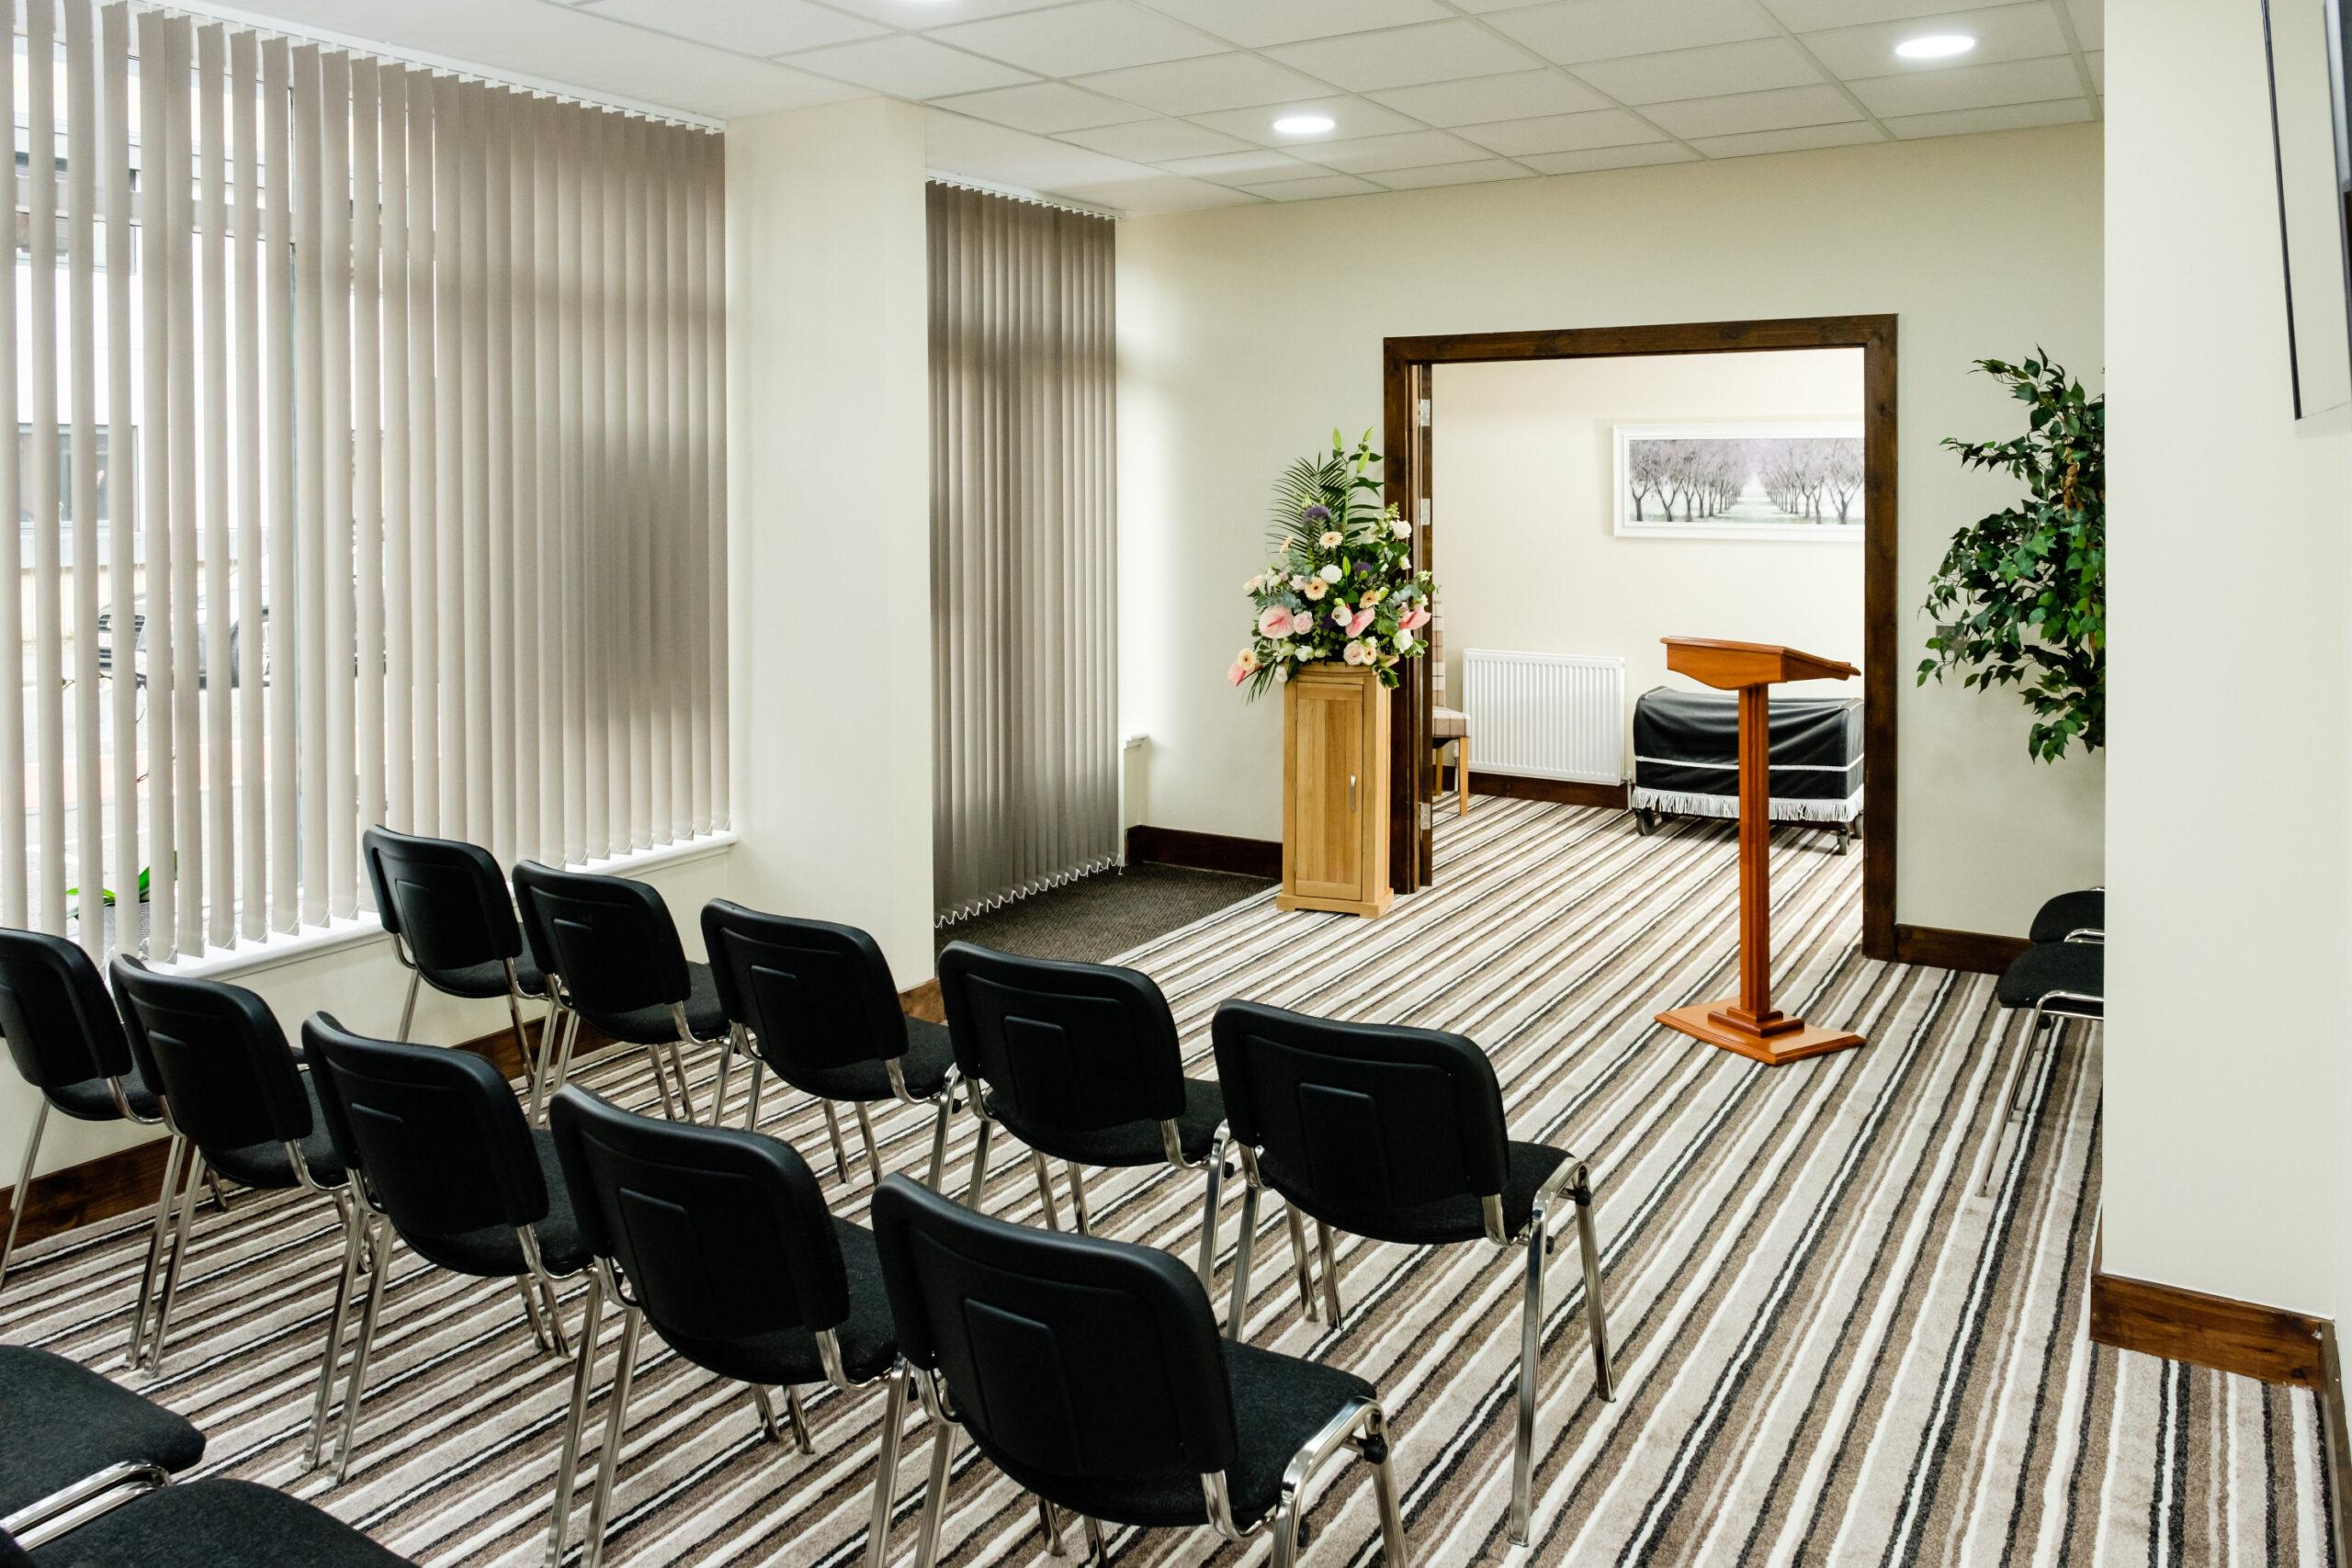 Service room in Kilmarnock funeral home